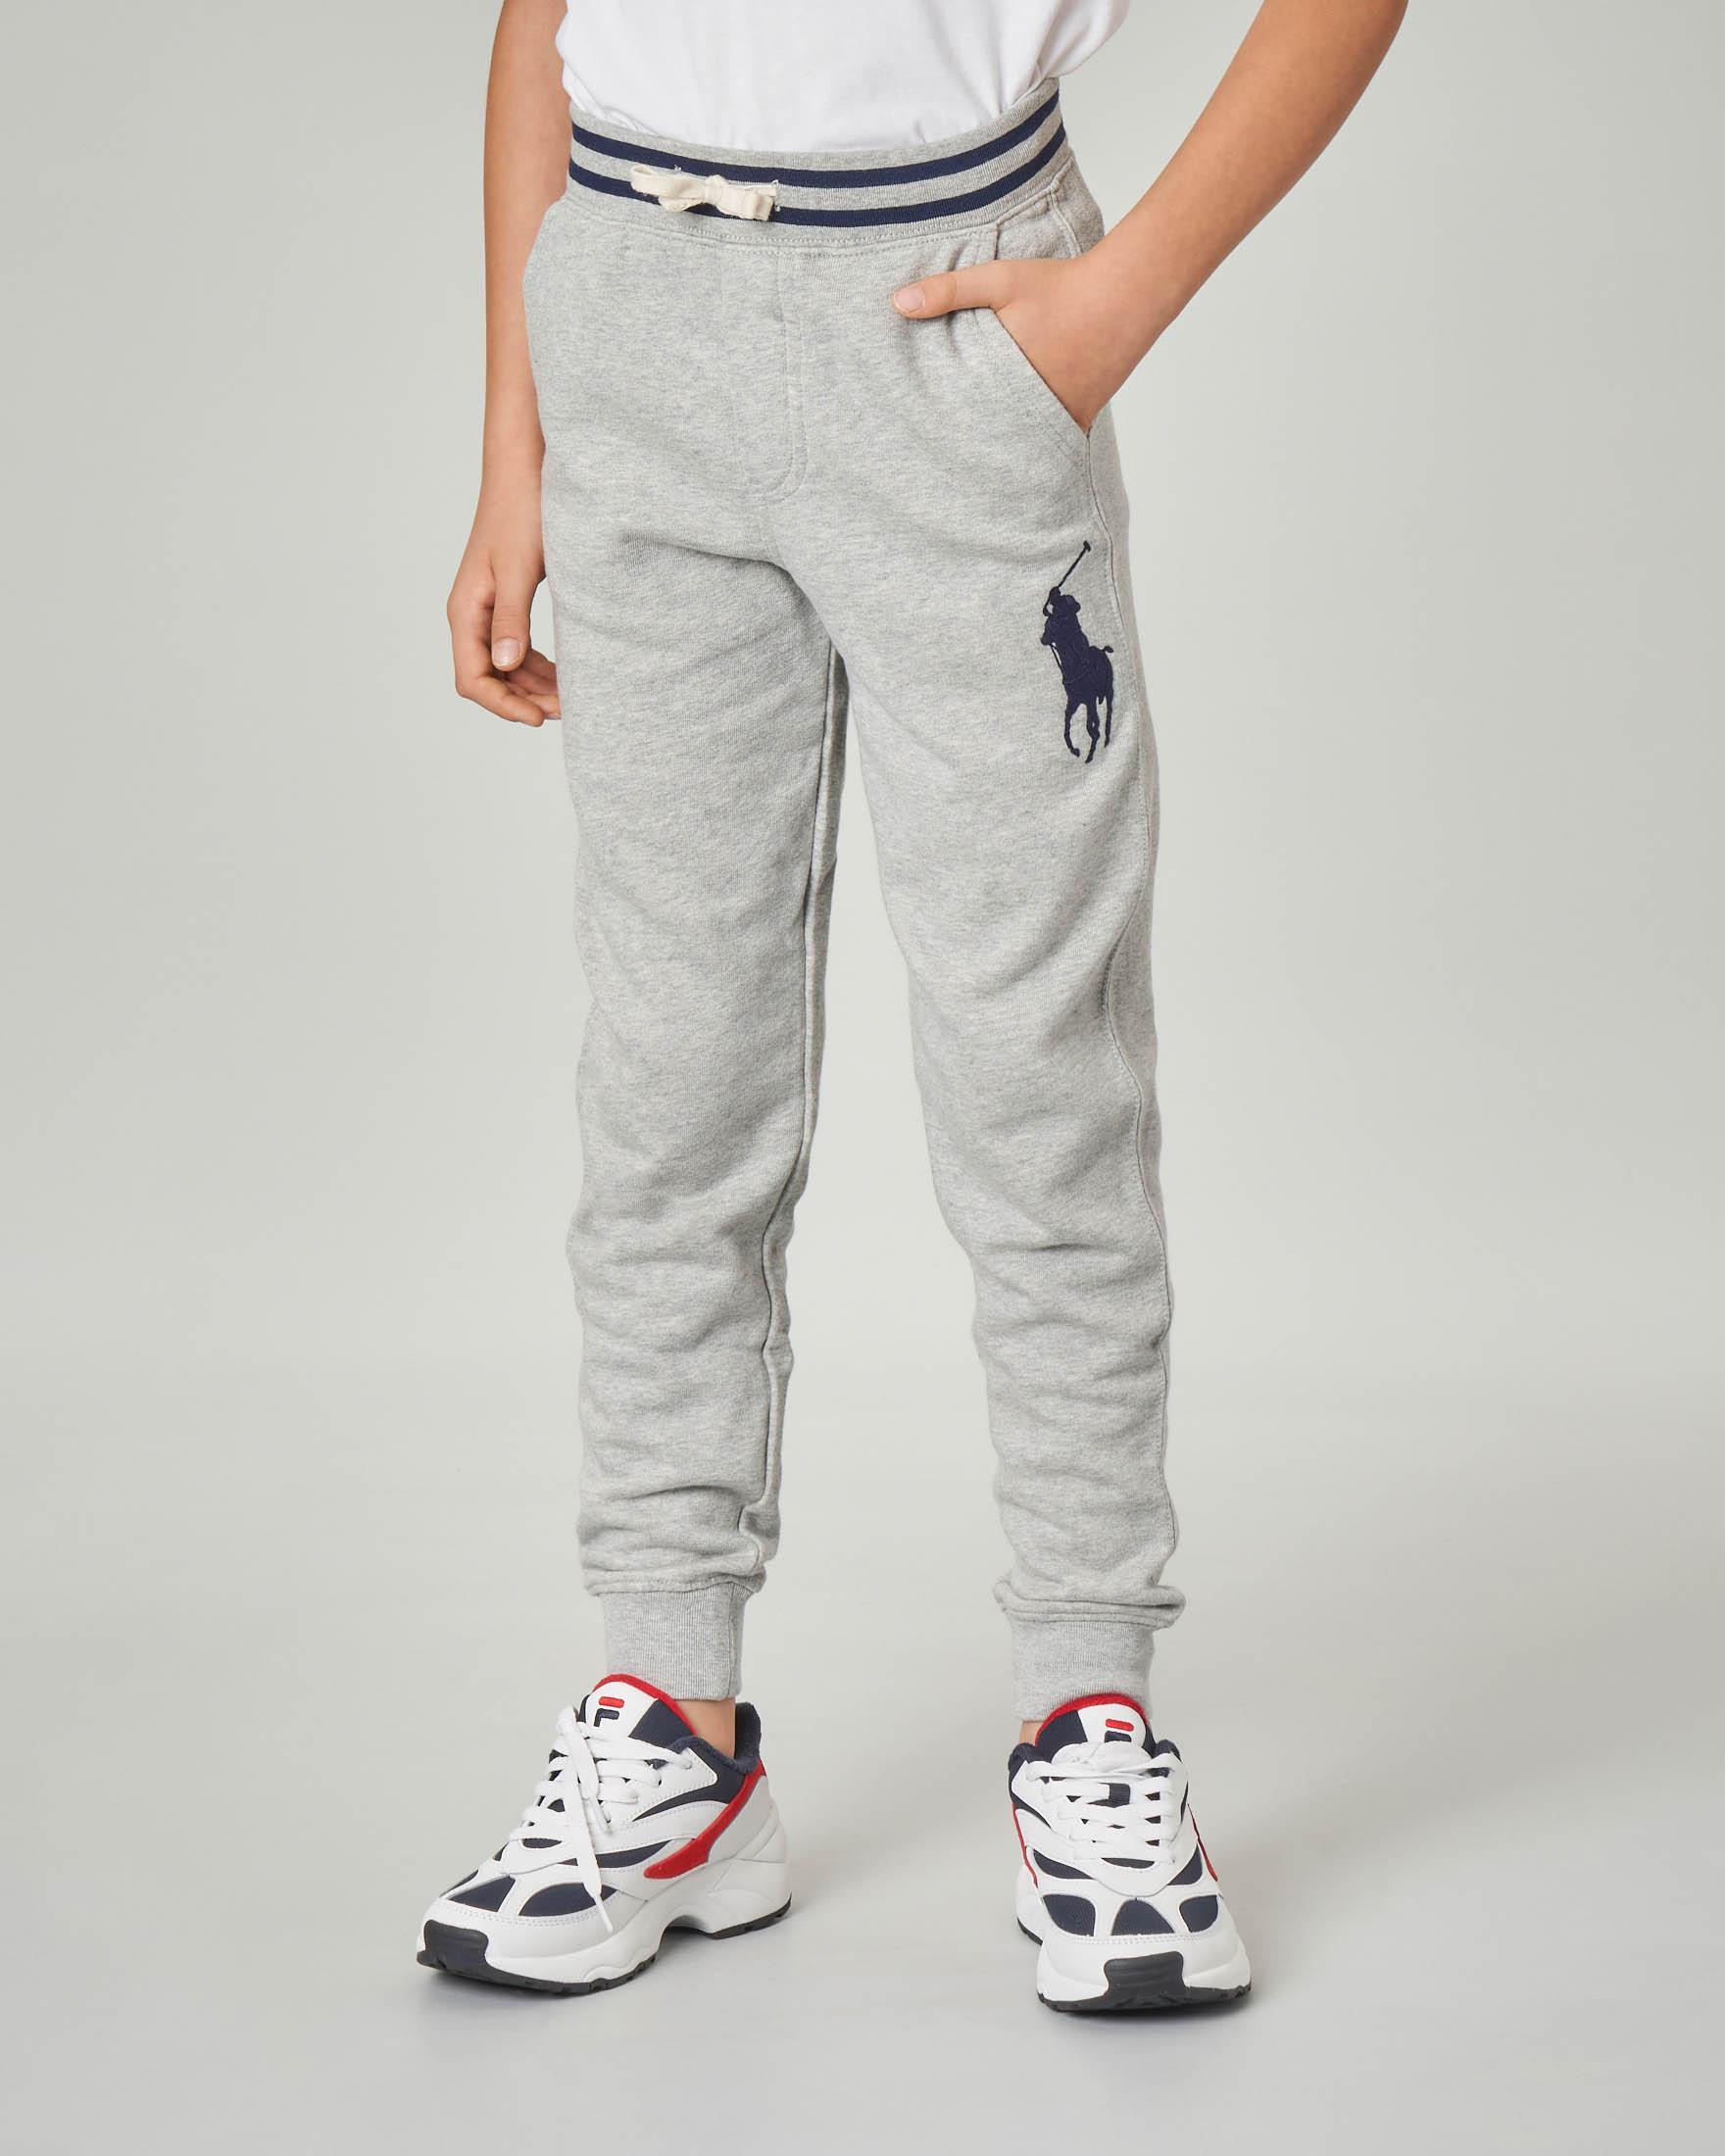 Pantalone grigio in felpa con big-pony blu ricamato S-XL